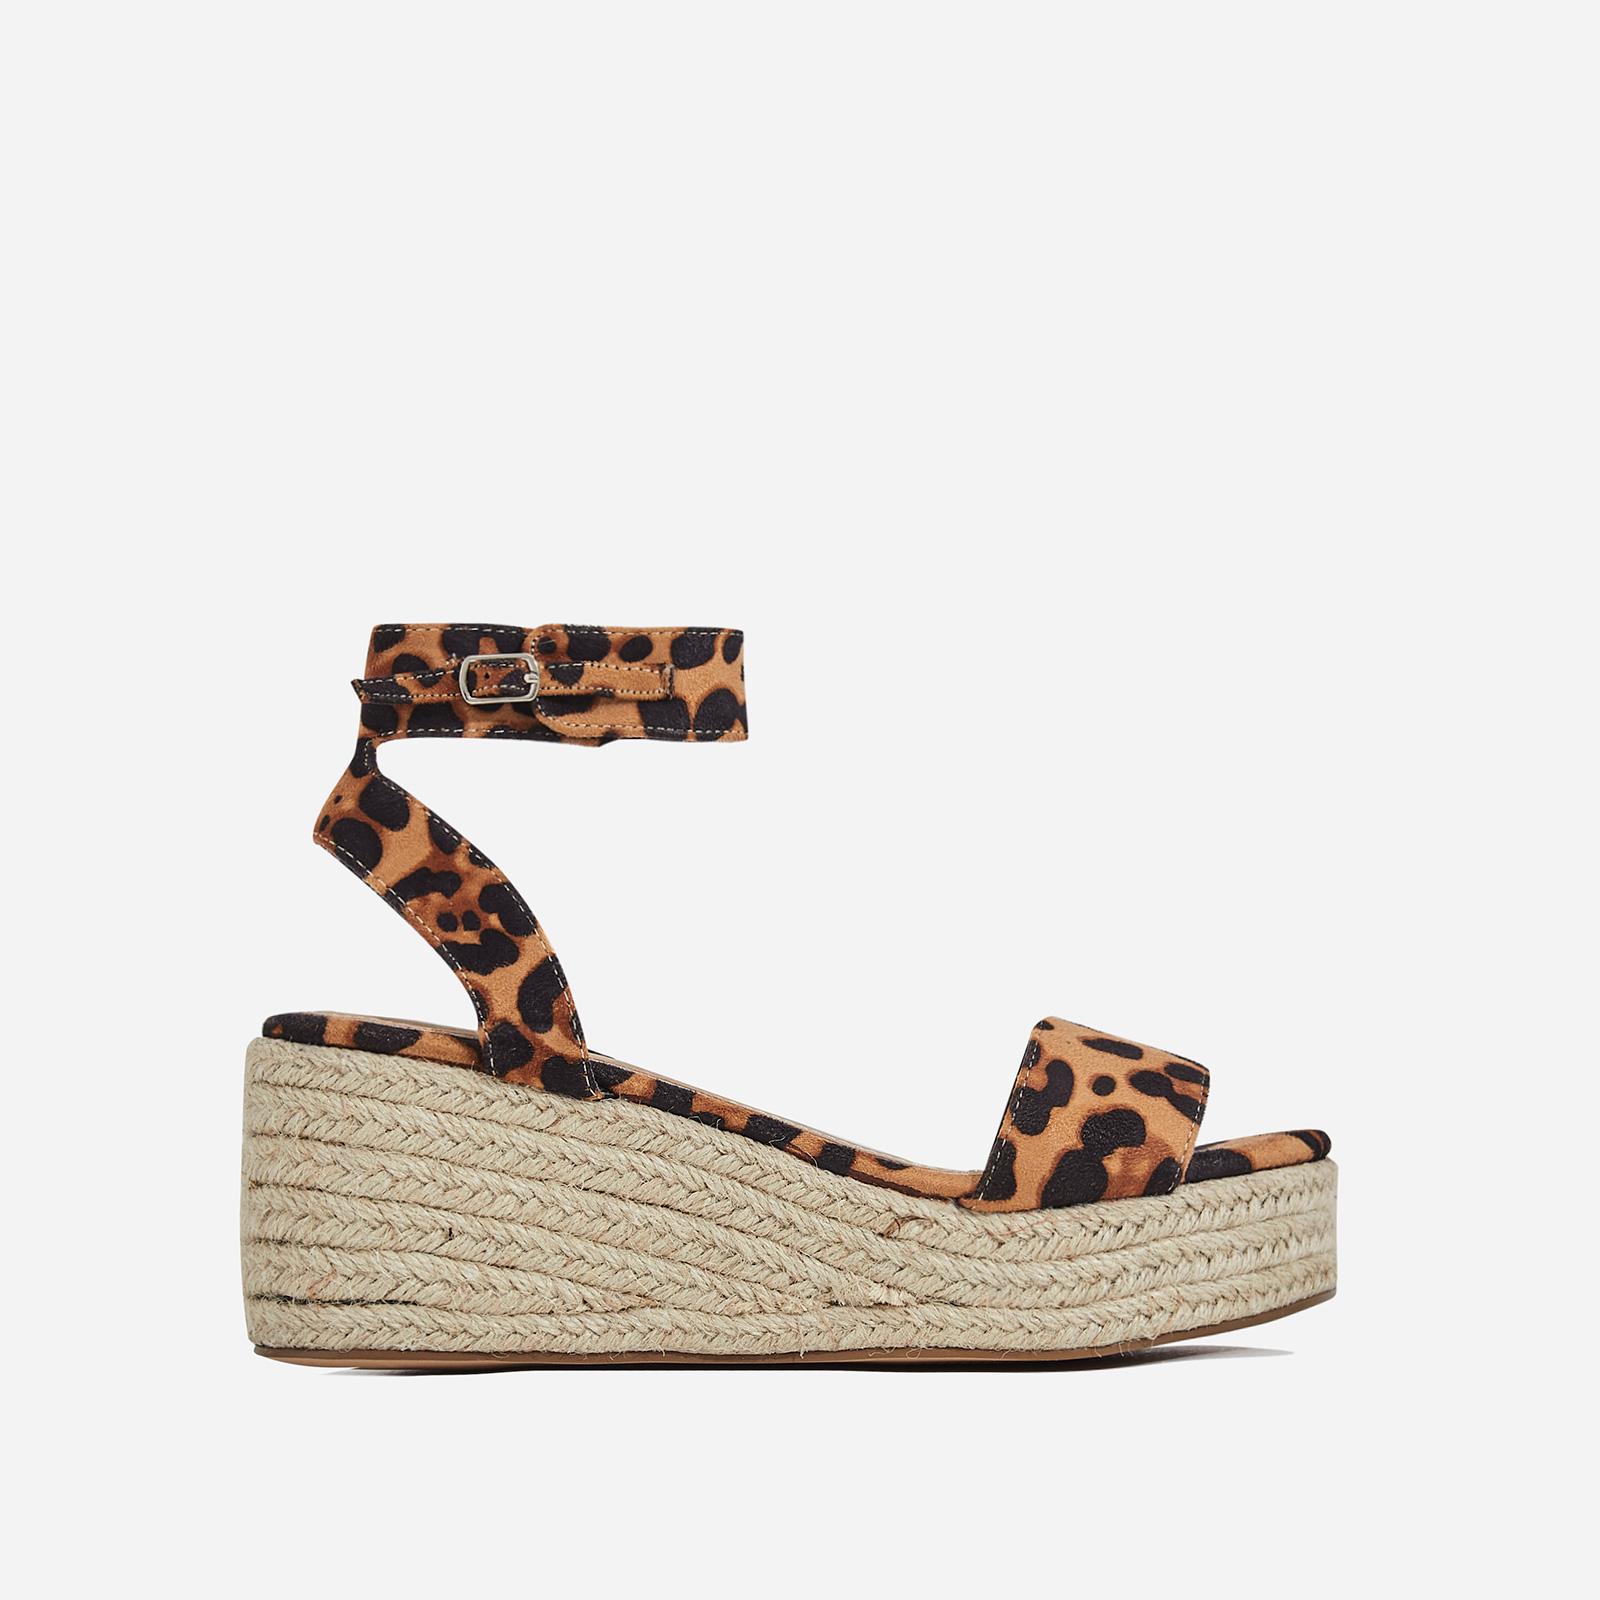 Rossi Espadrille Sandal In Tan Leopard Faux Suede